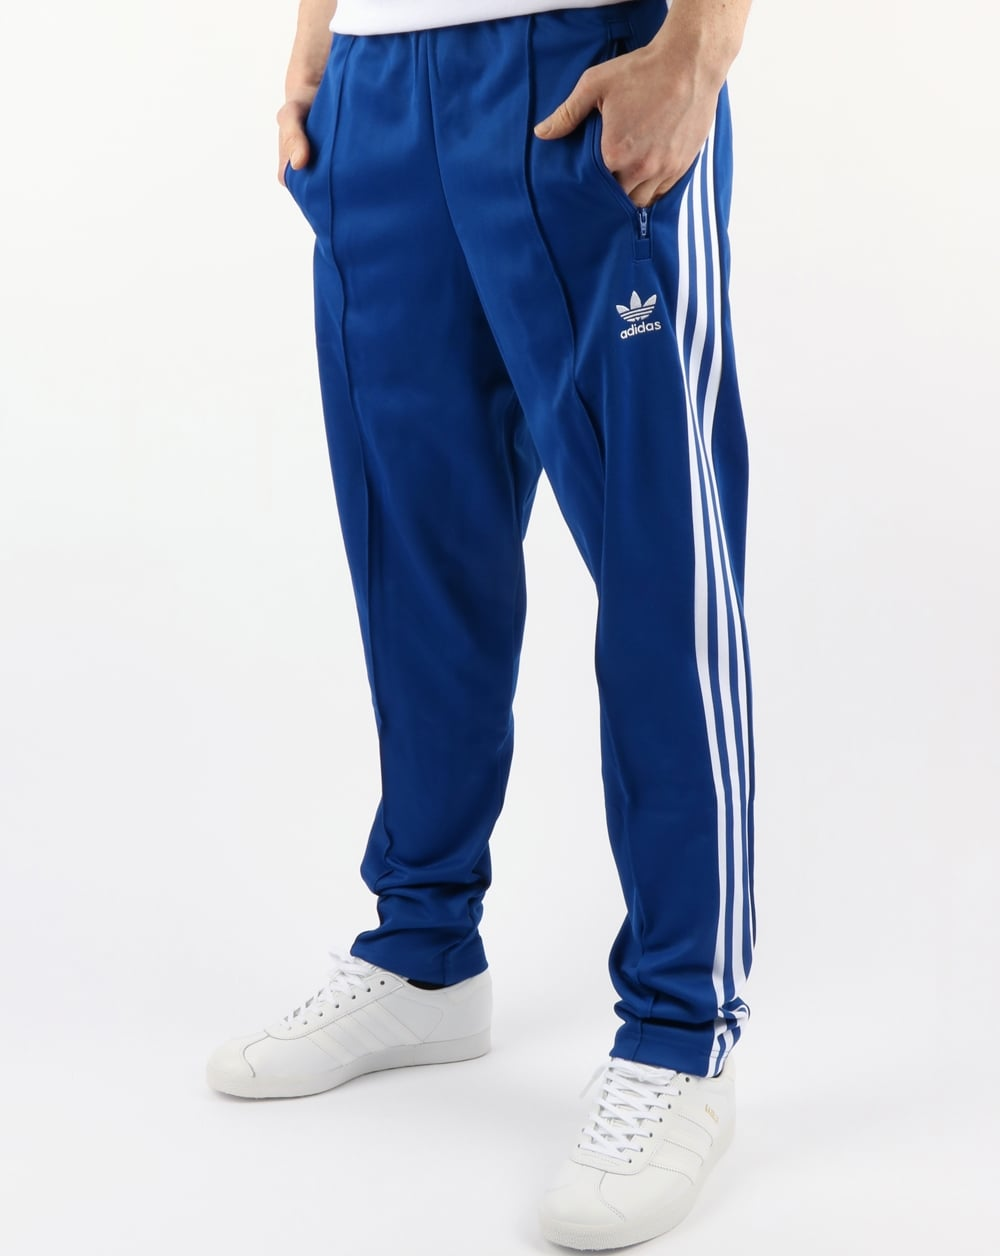 ligeramente Inmundicia explosión  Adidas Originals Beckenbauer Track Pants Royal,blue,tracksuit,bottoms